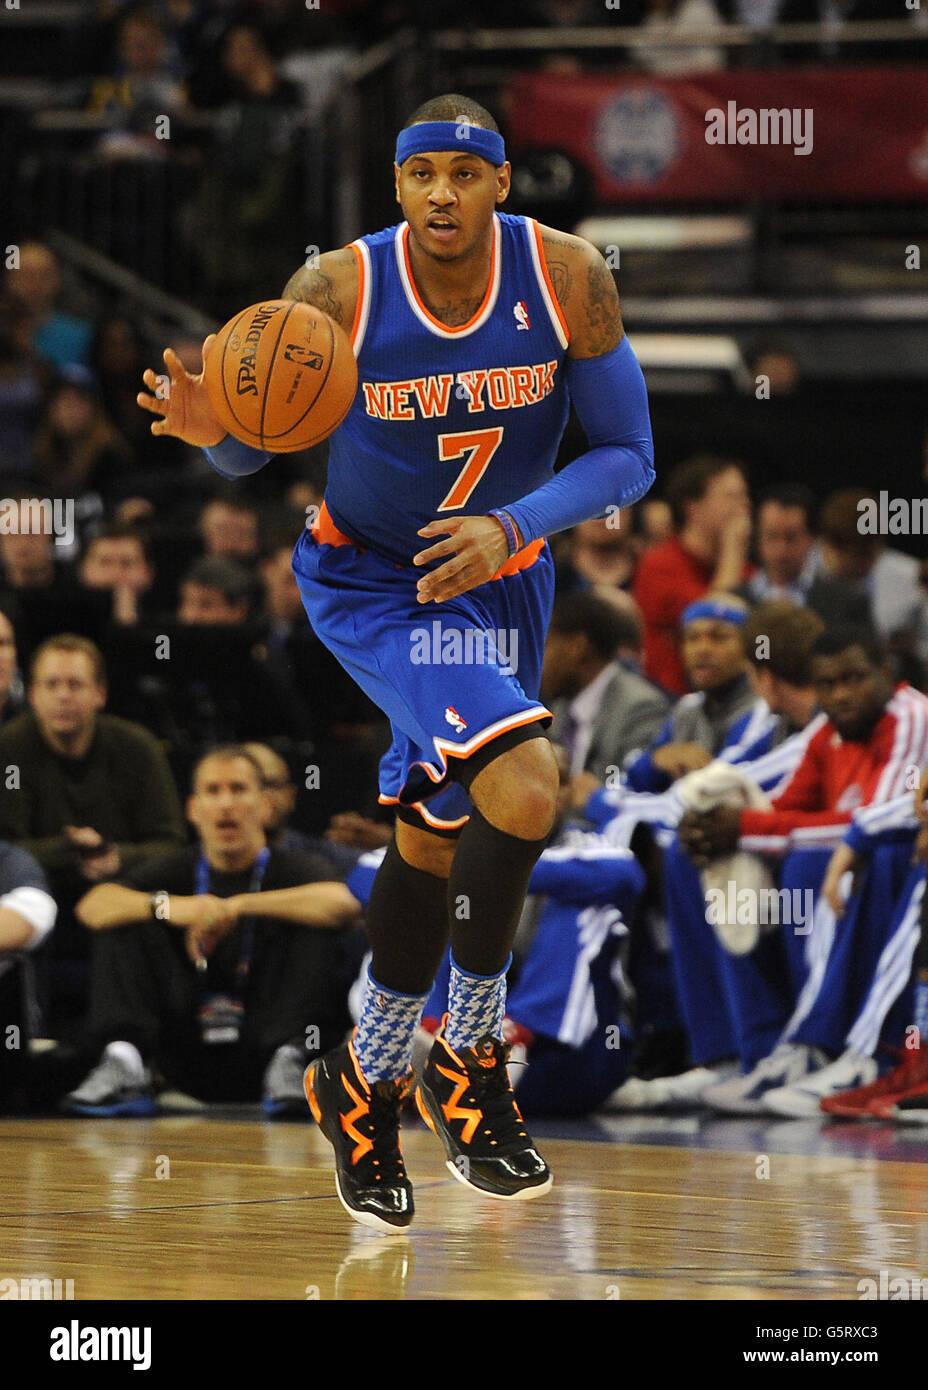 Nba Basketball New York Knicks: Knicks Stock Photos & Knicks Stock Images